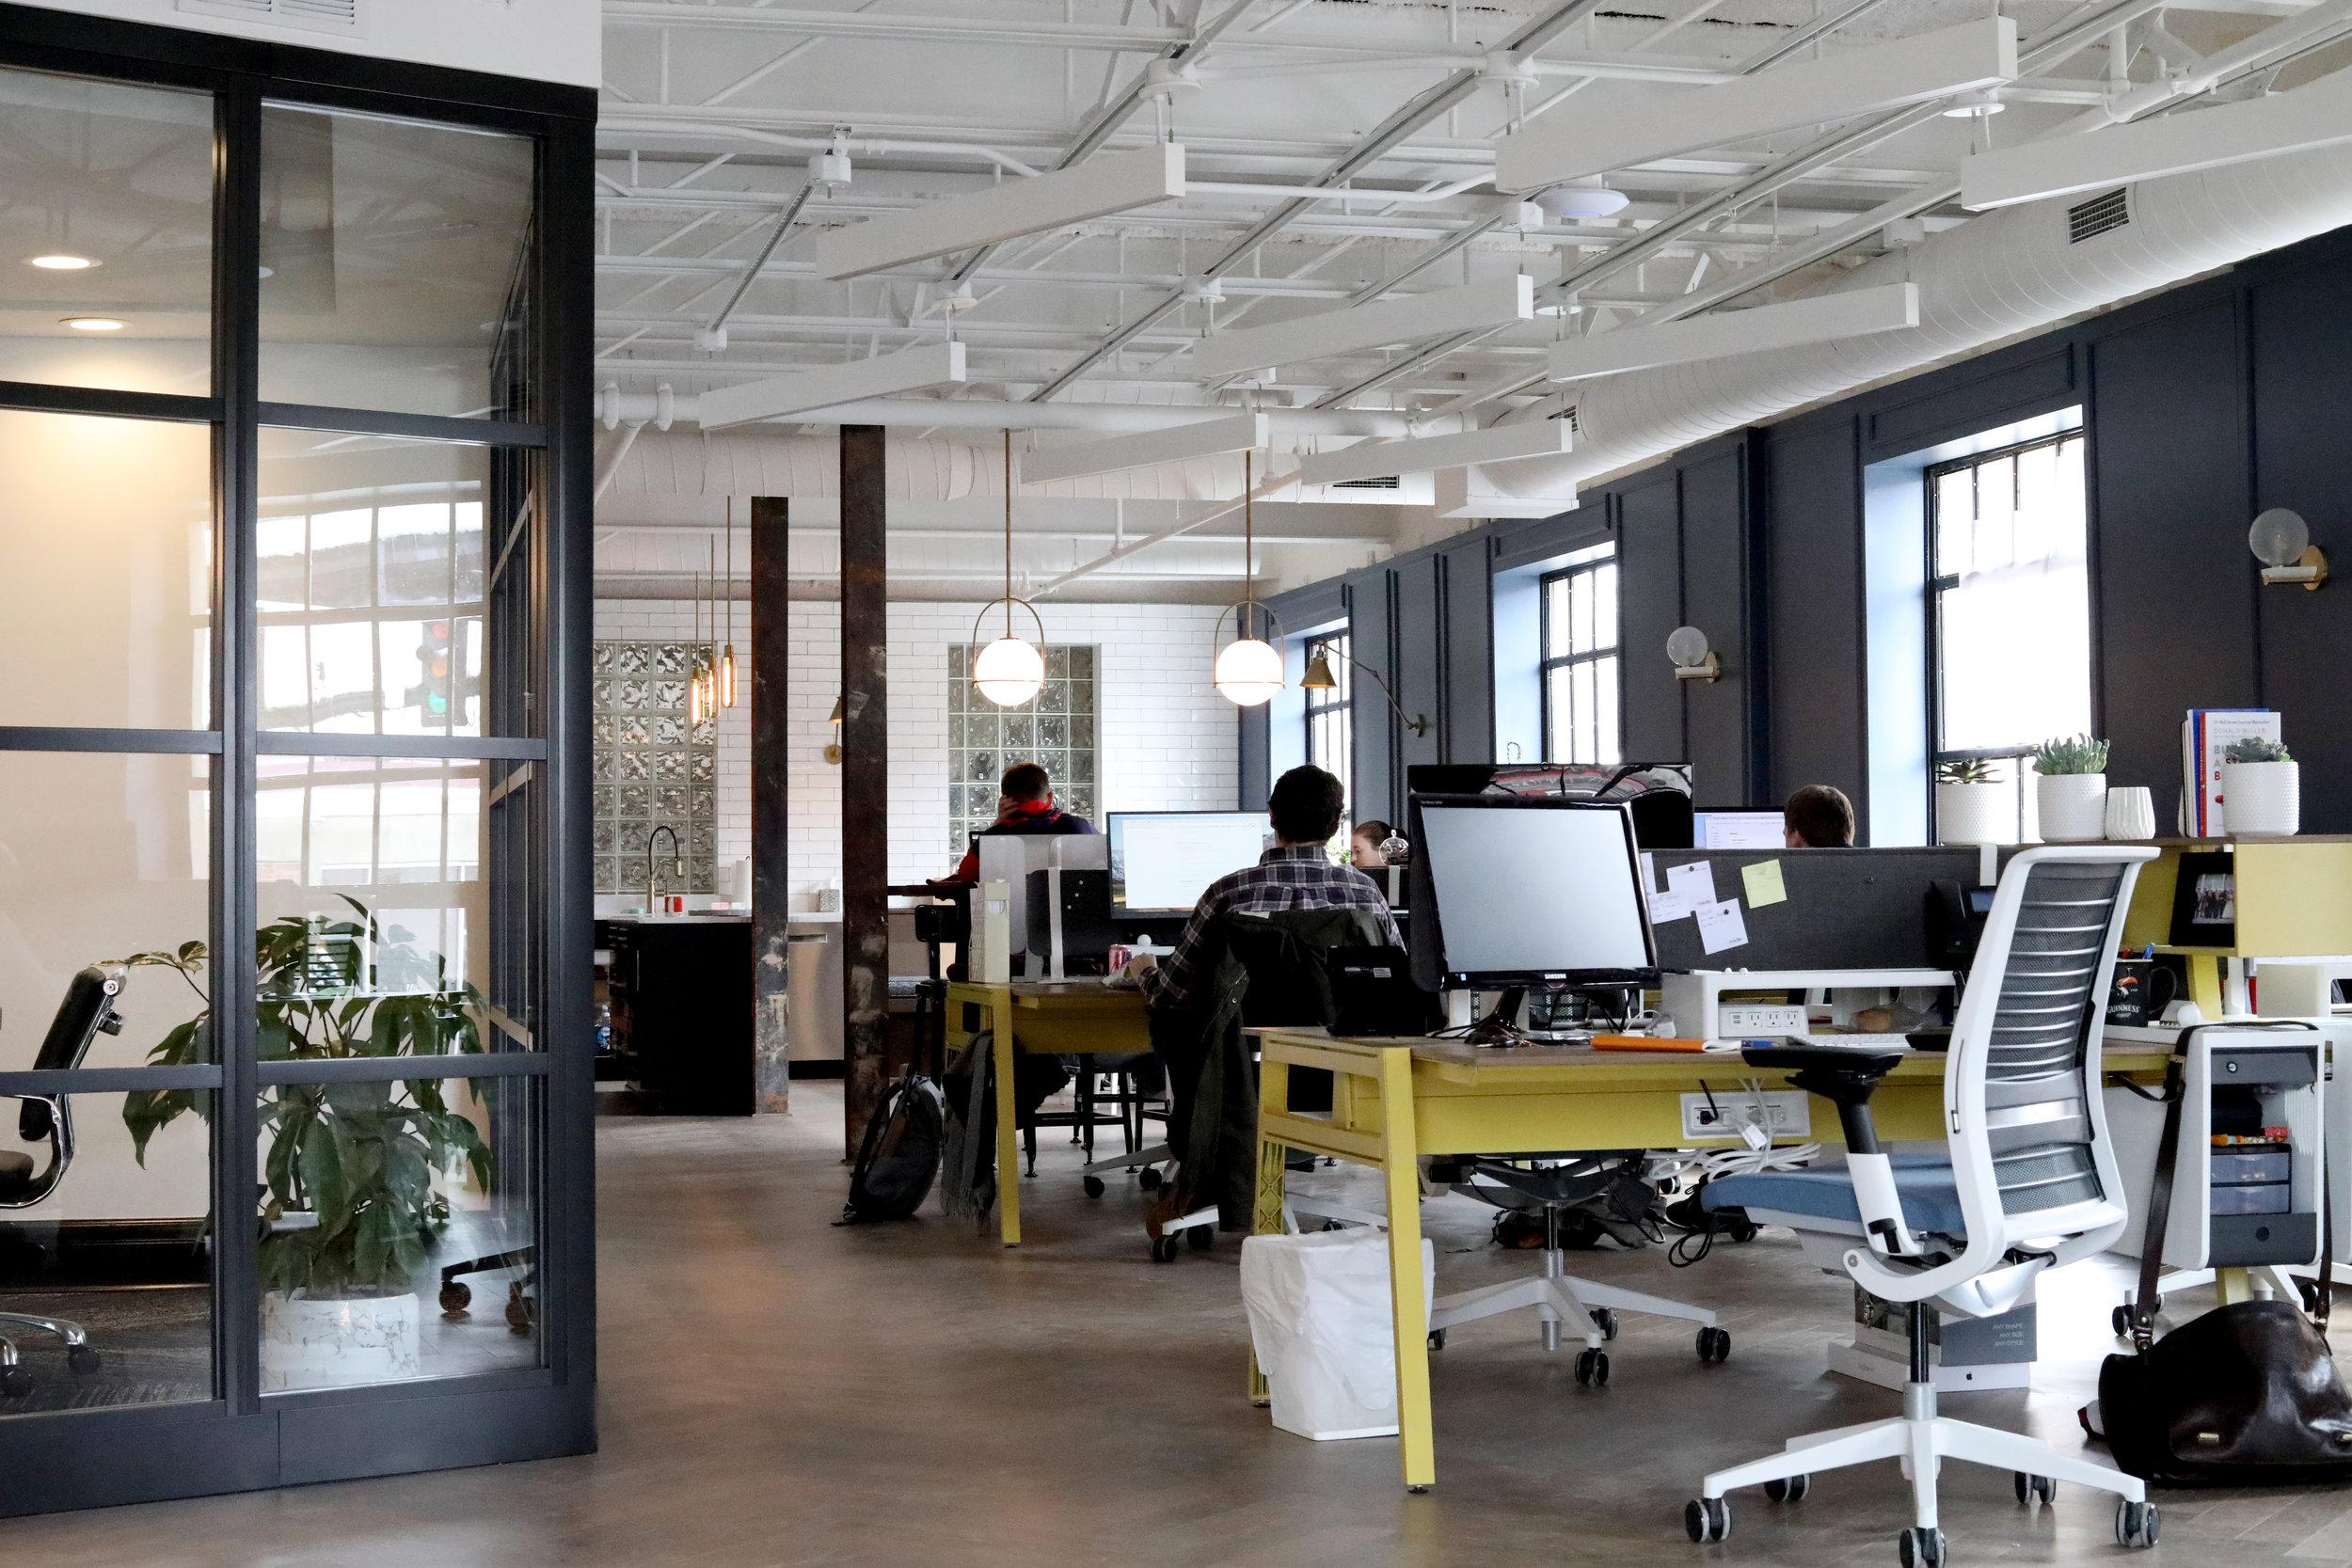 WEBSITE DEVELOPMENTS - We create websites that increase customer engagement & generate sales leads